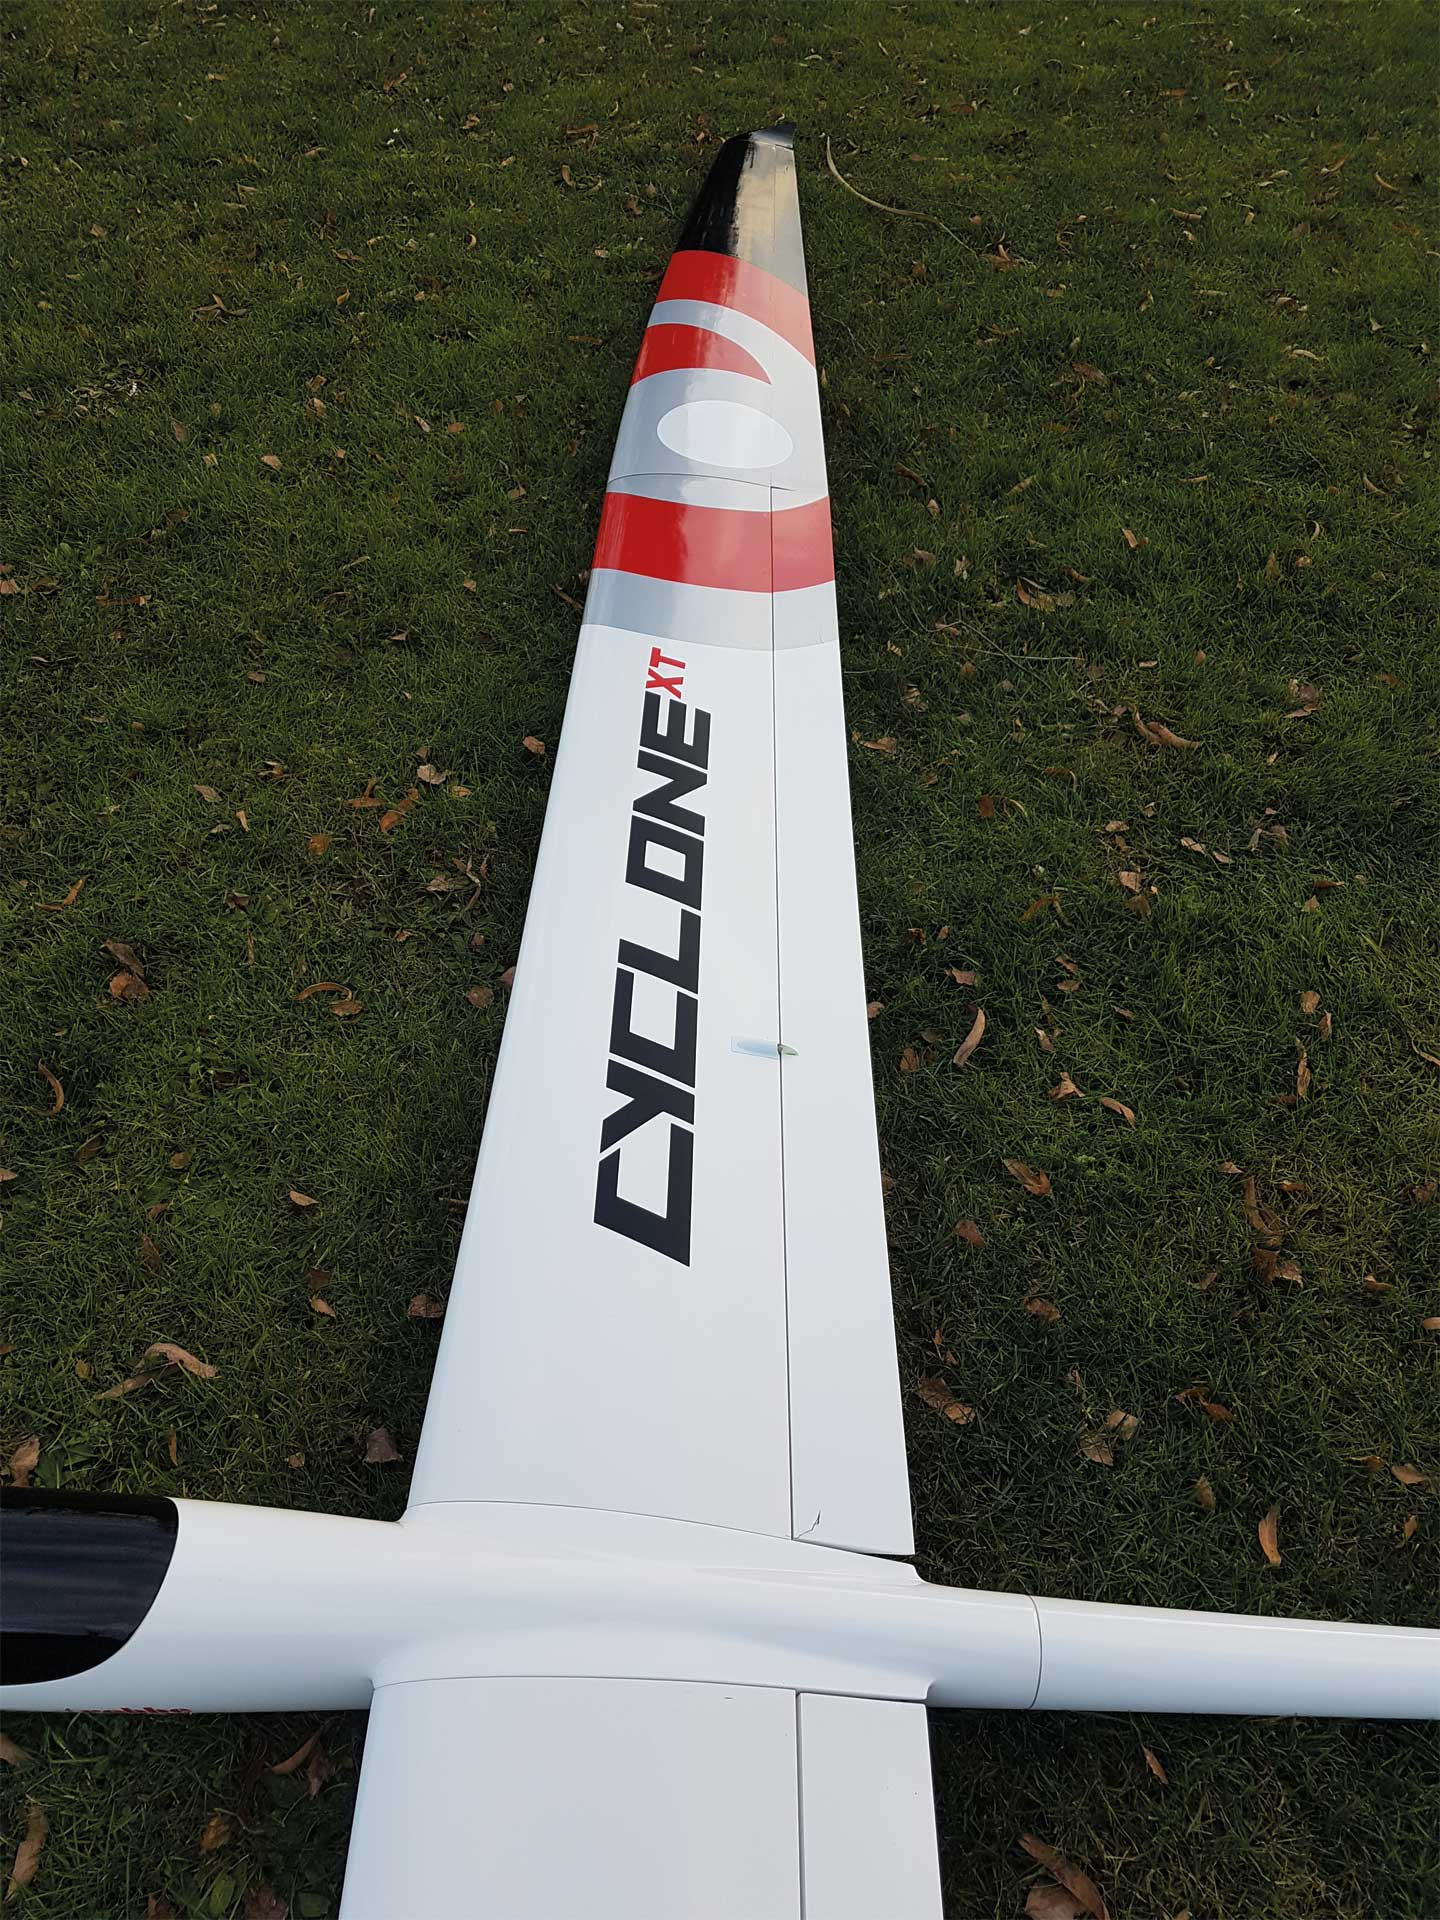 Robbe Modellsport Cyclone XT 6,2M ARF mit GFK Rumpf, 4-tlg Tragflächen mit Abachi-Beplankung